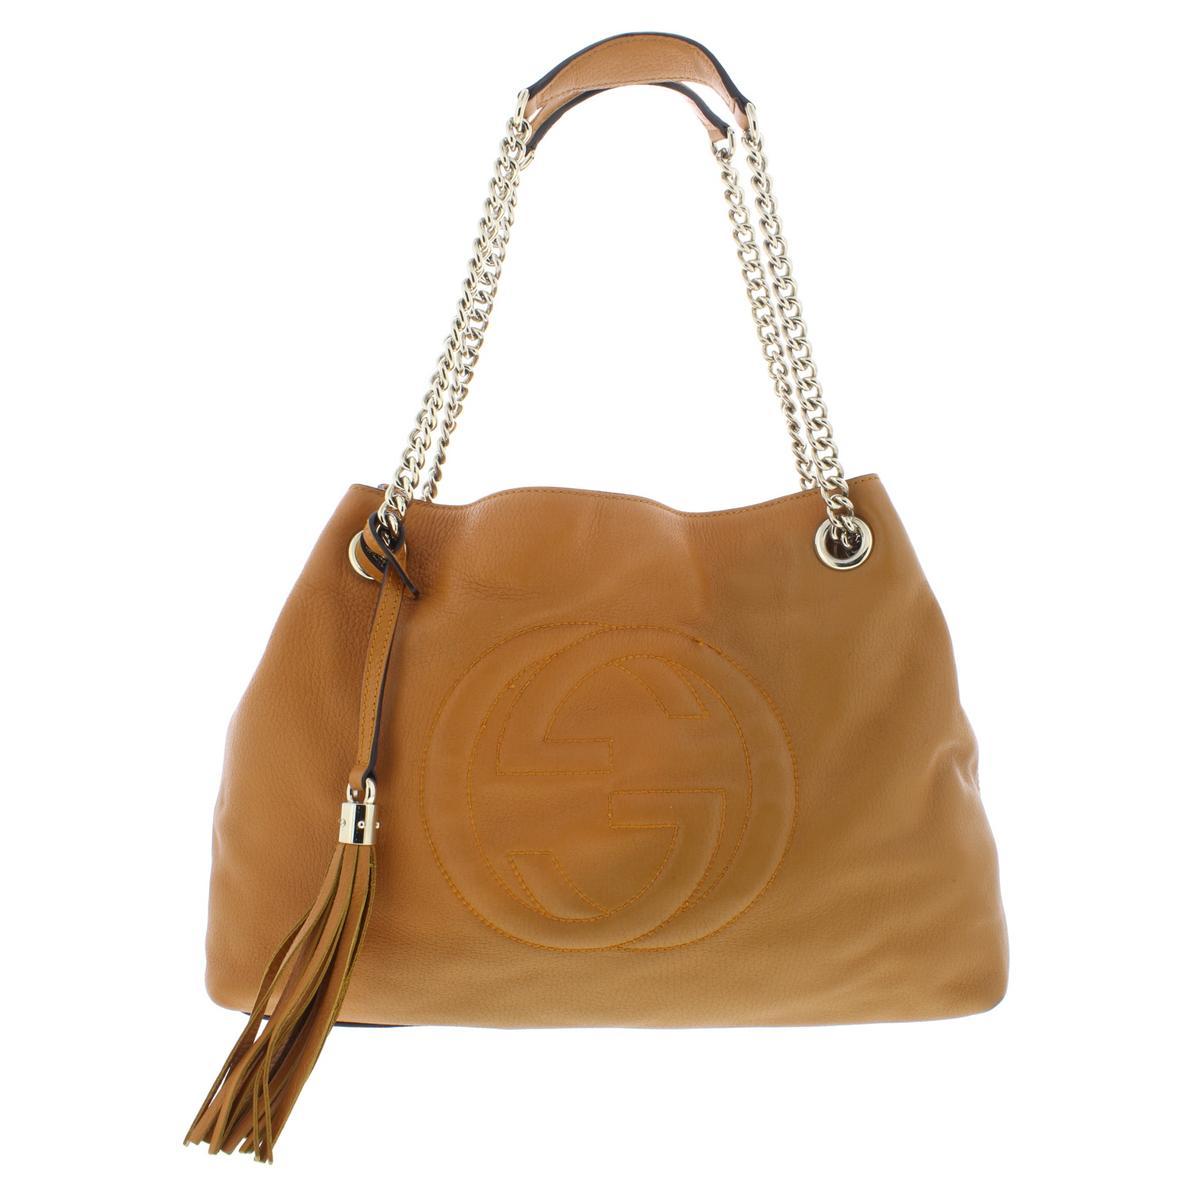 f75b15c35 Details about Gucci Womens Soho Tan Leather Tote Shoulder Handbag Purse  Large BHFO 5969